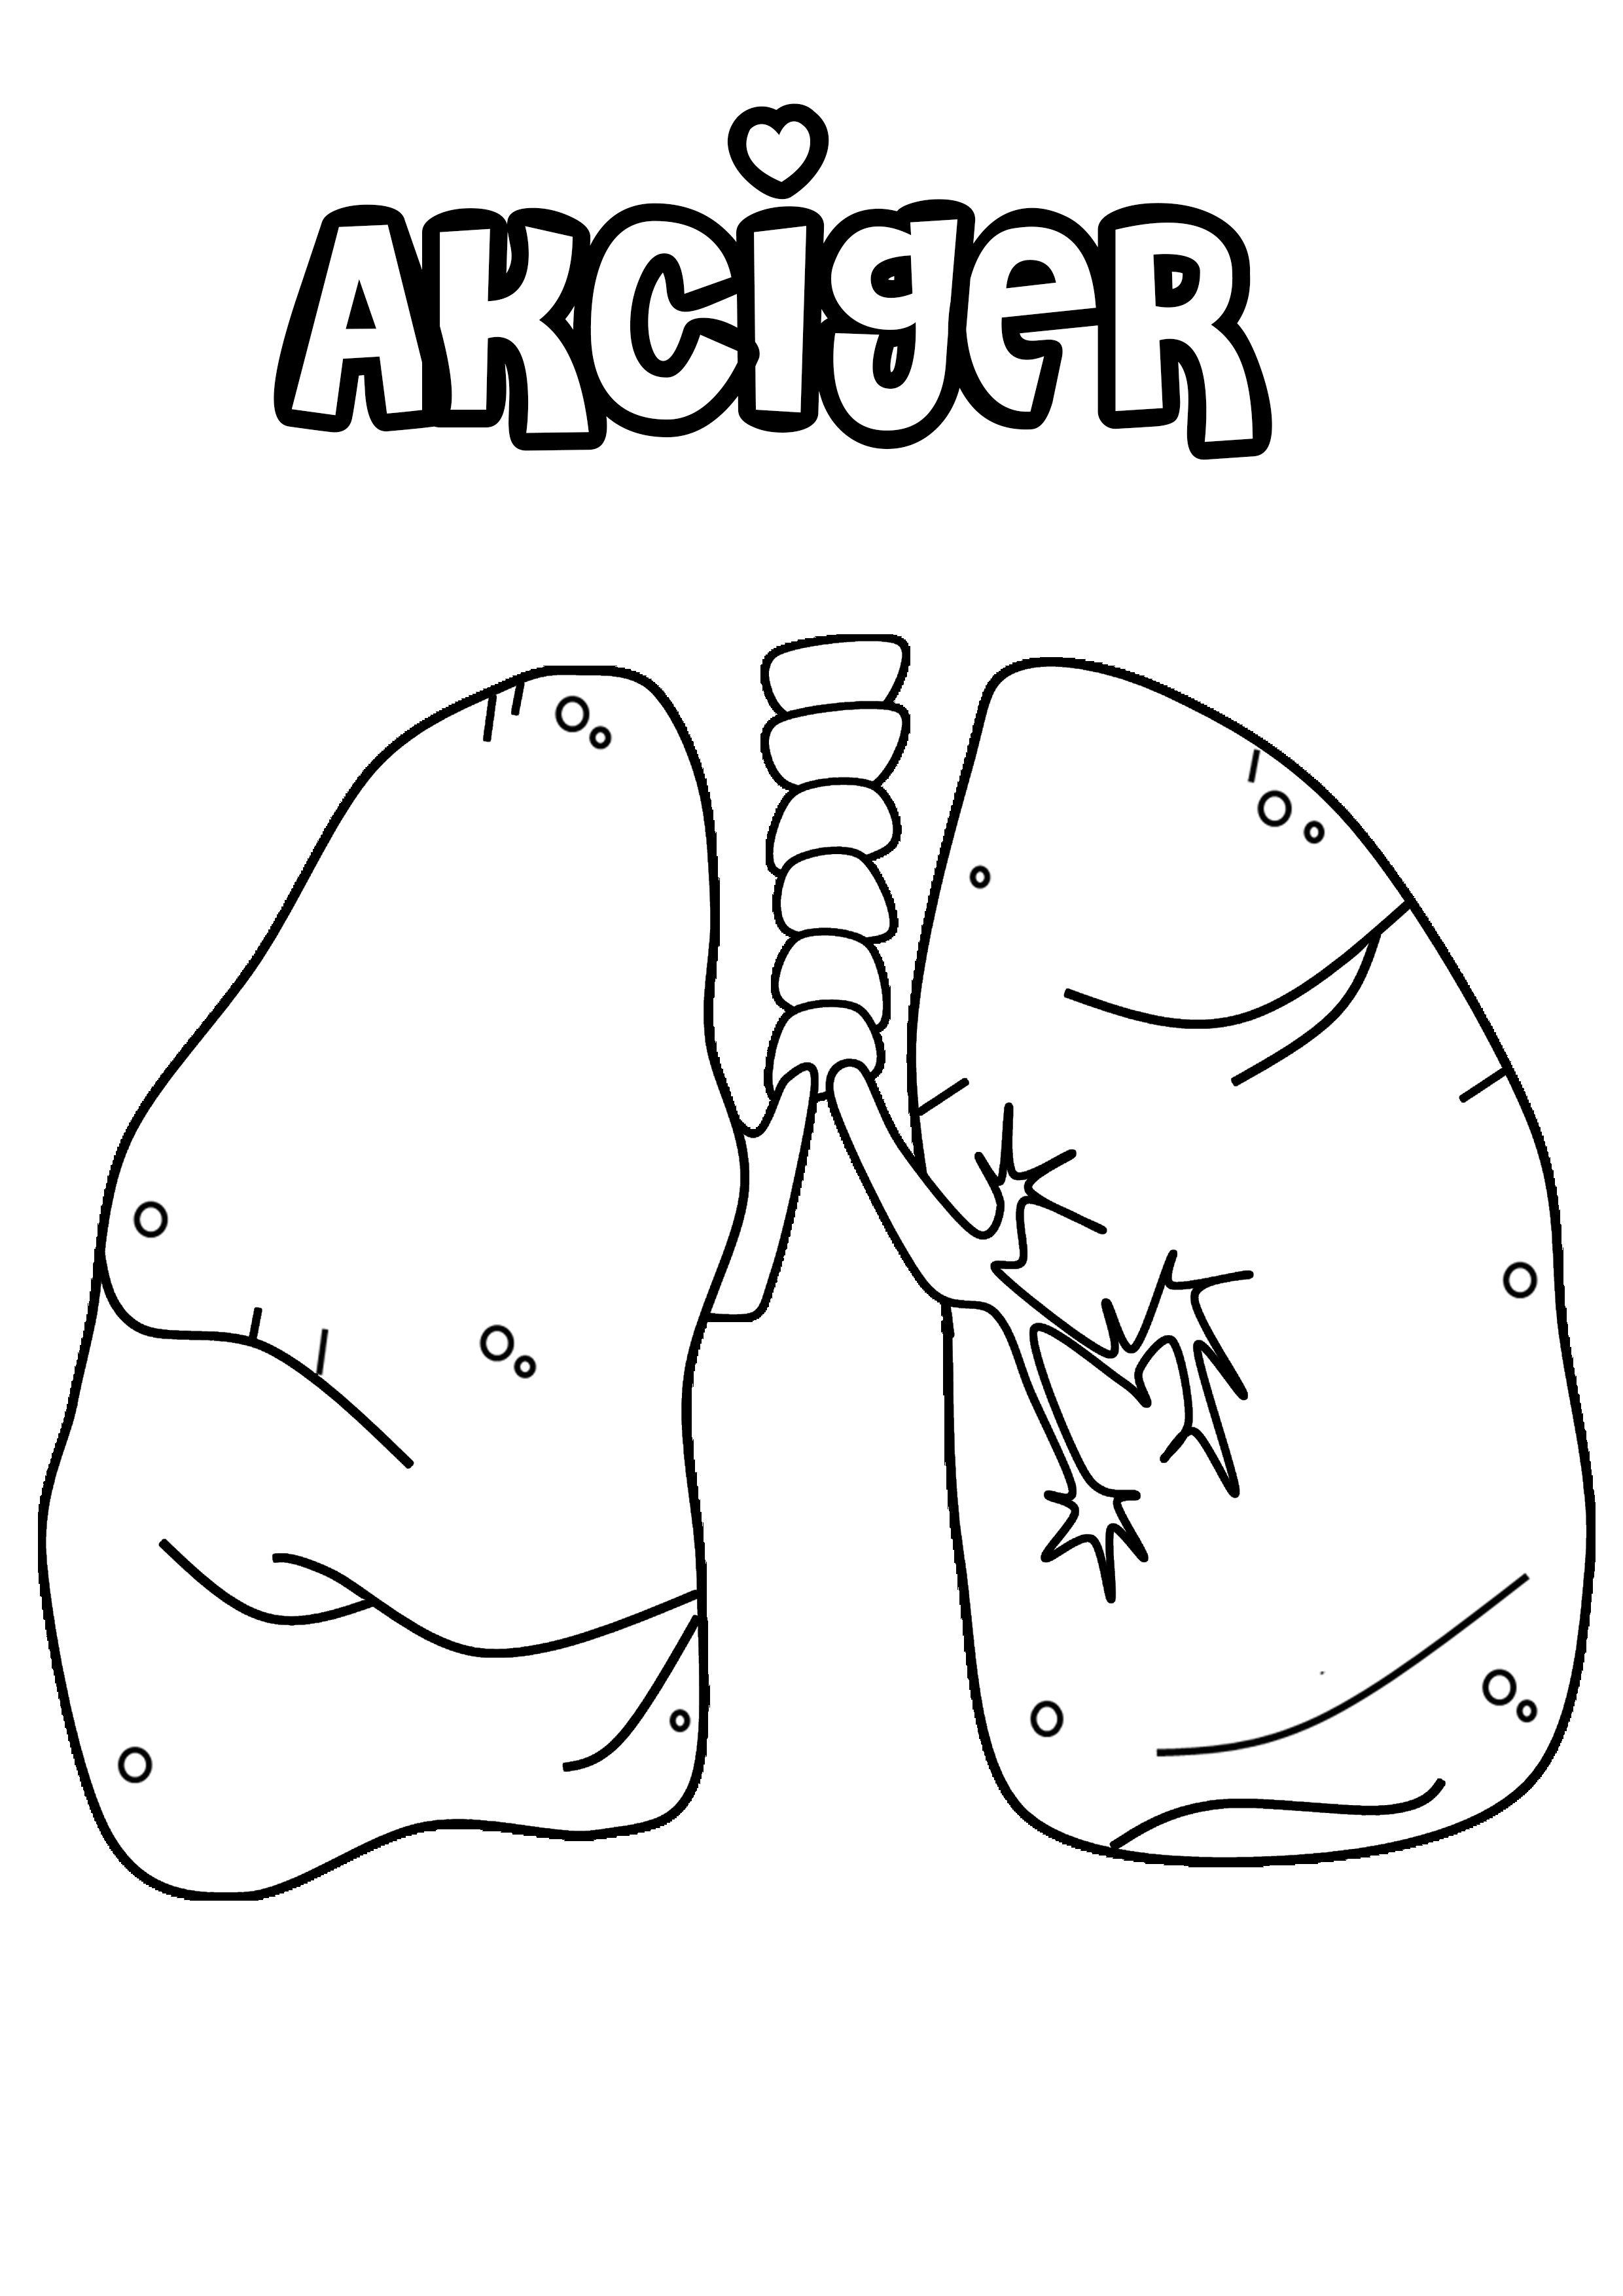 Etkinlikarsivim Tarafindan Organlar Panosundaki Fikir Insan